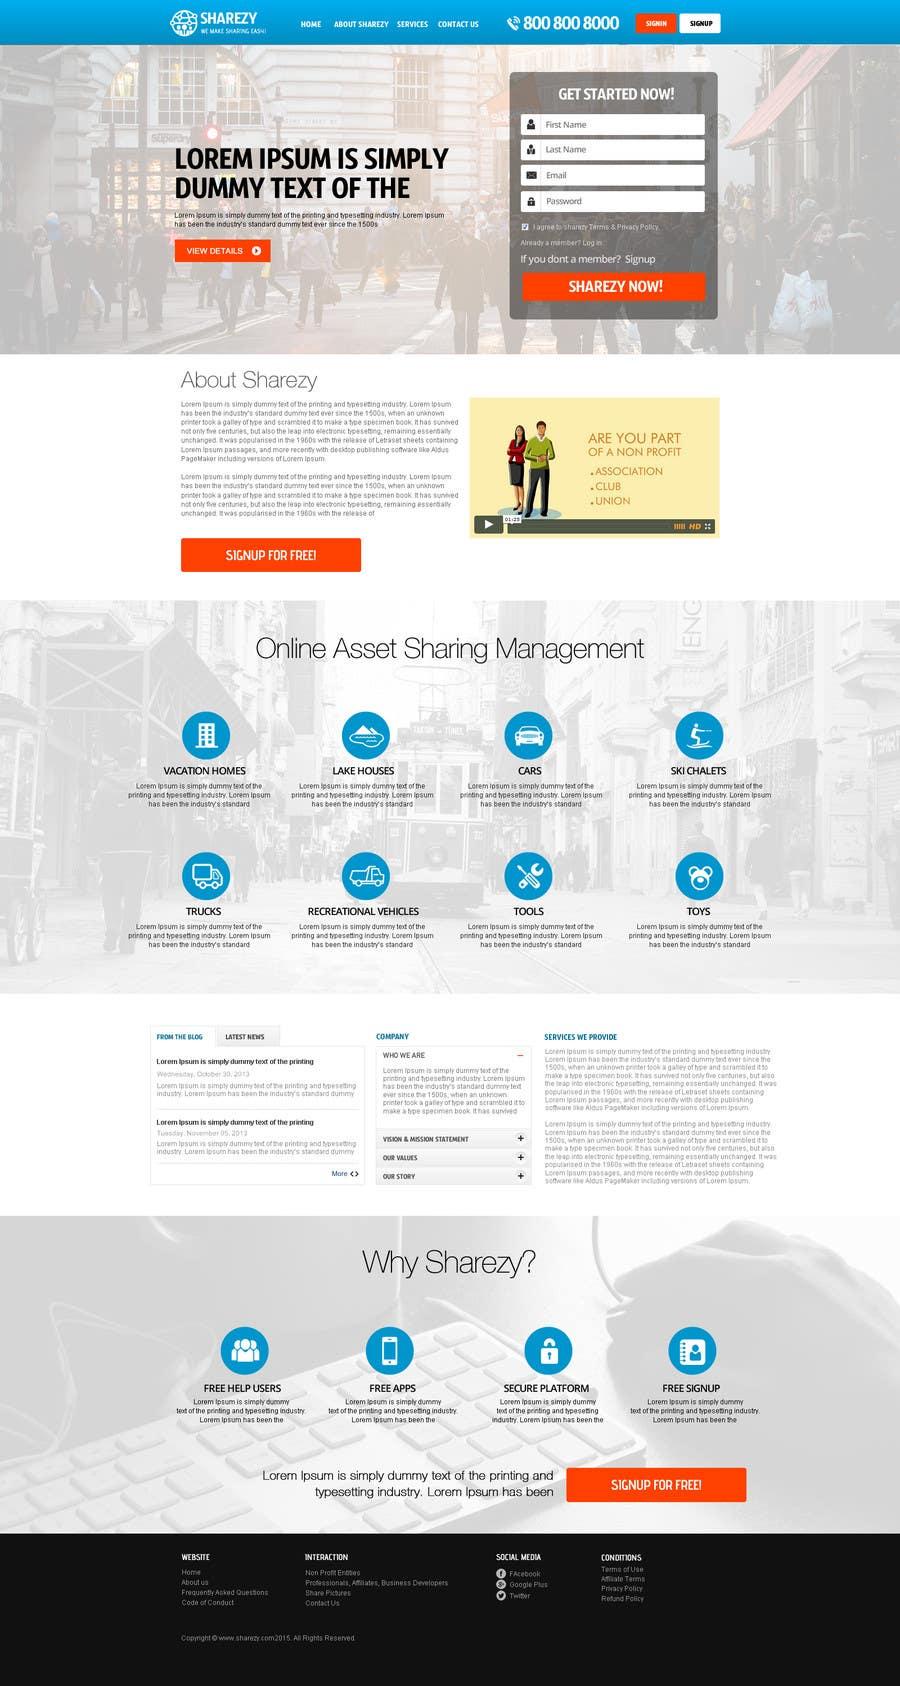 Penyertaan Peraduan #39 untuk Design a Website and Logo Mockup for a new Online Asset Sharing Service